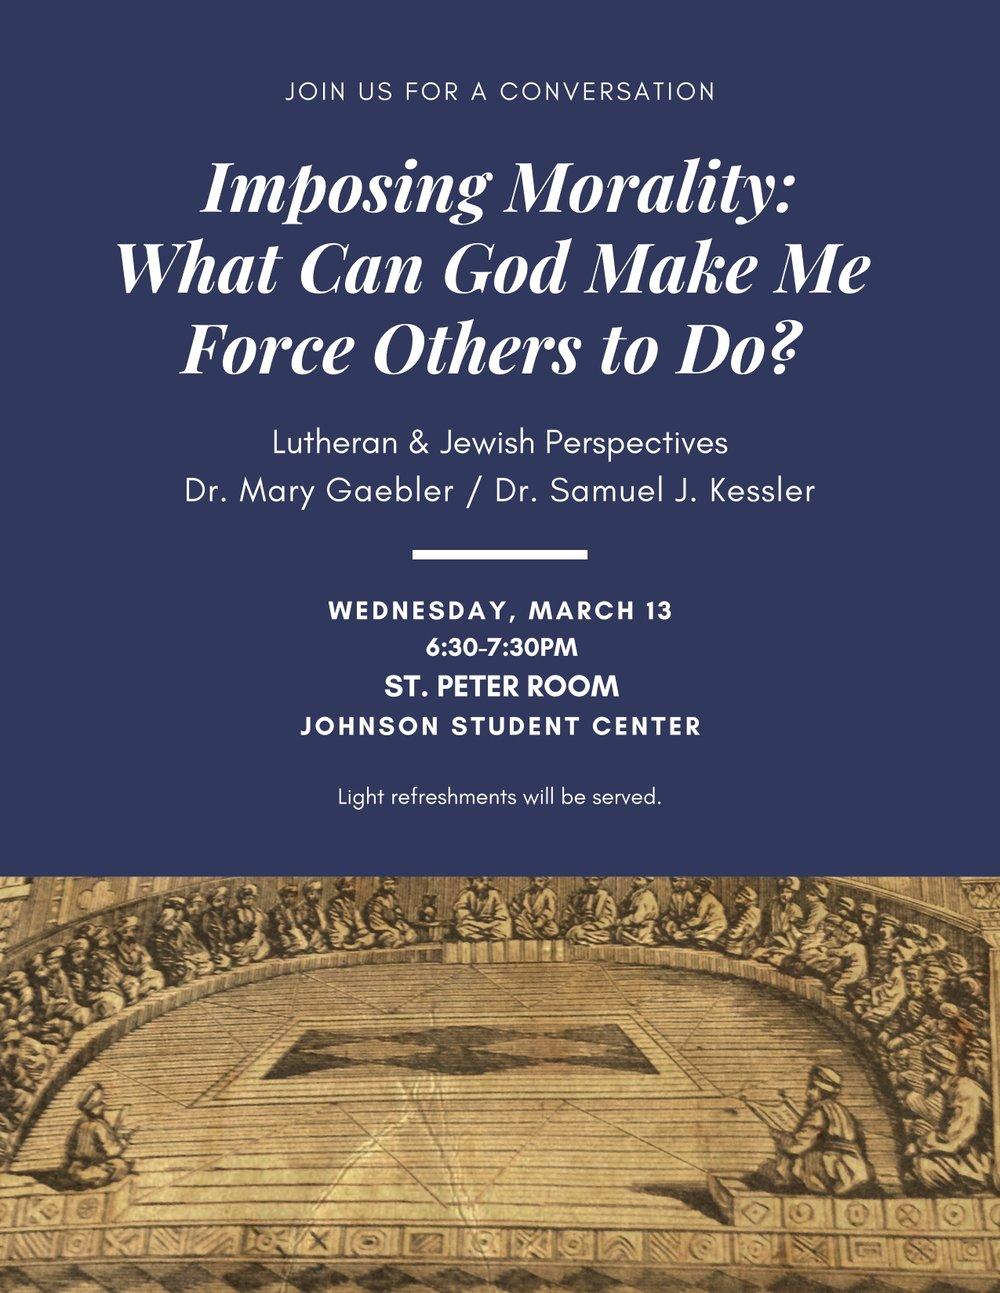 Imposing Morality_March 13, 2019_Gustavus Adolphus College.jpg